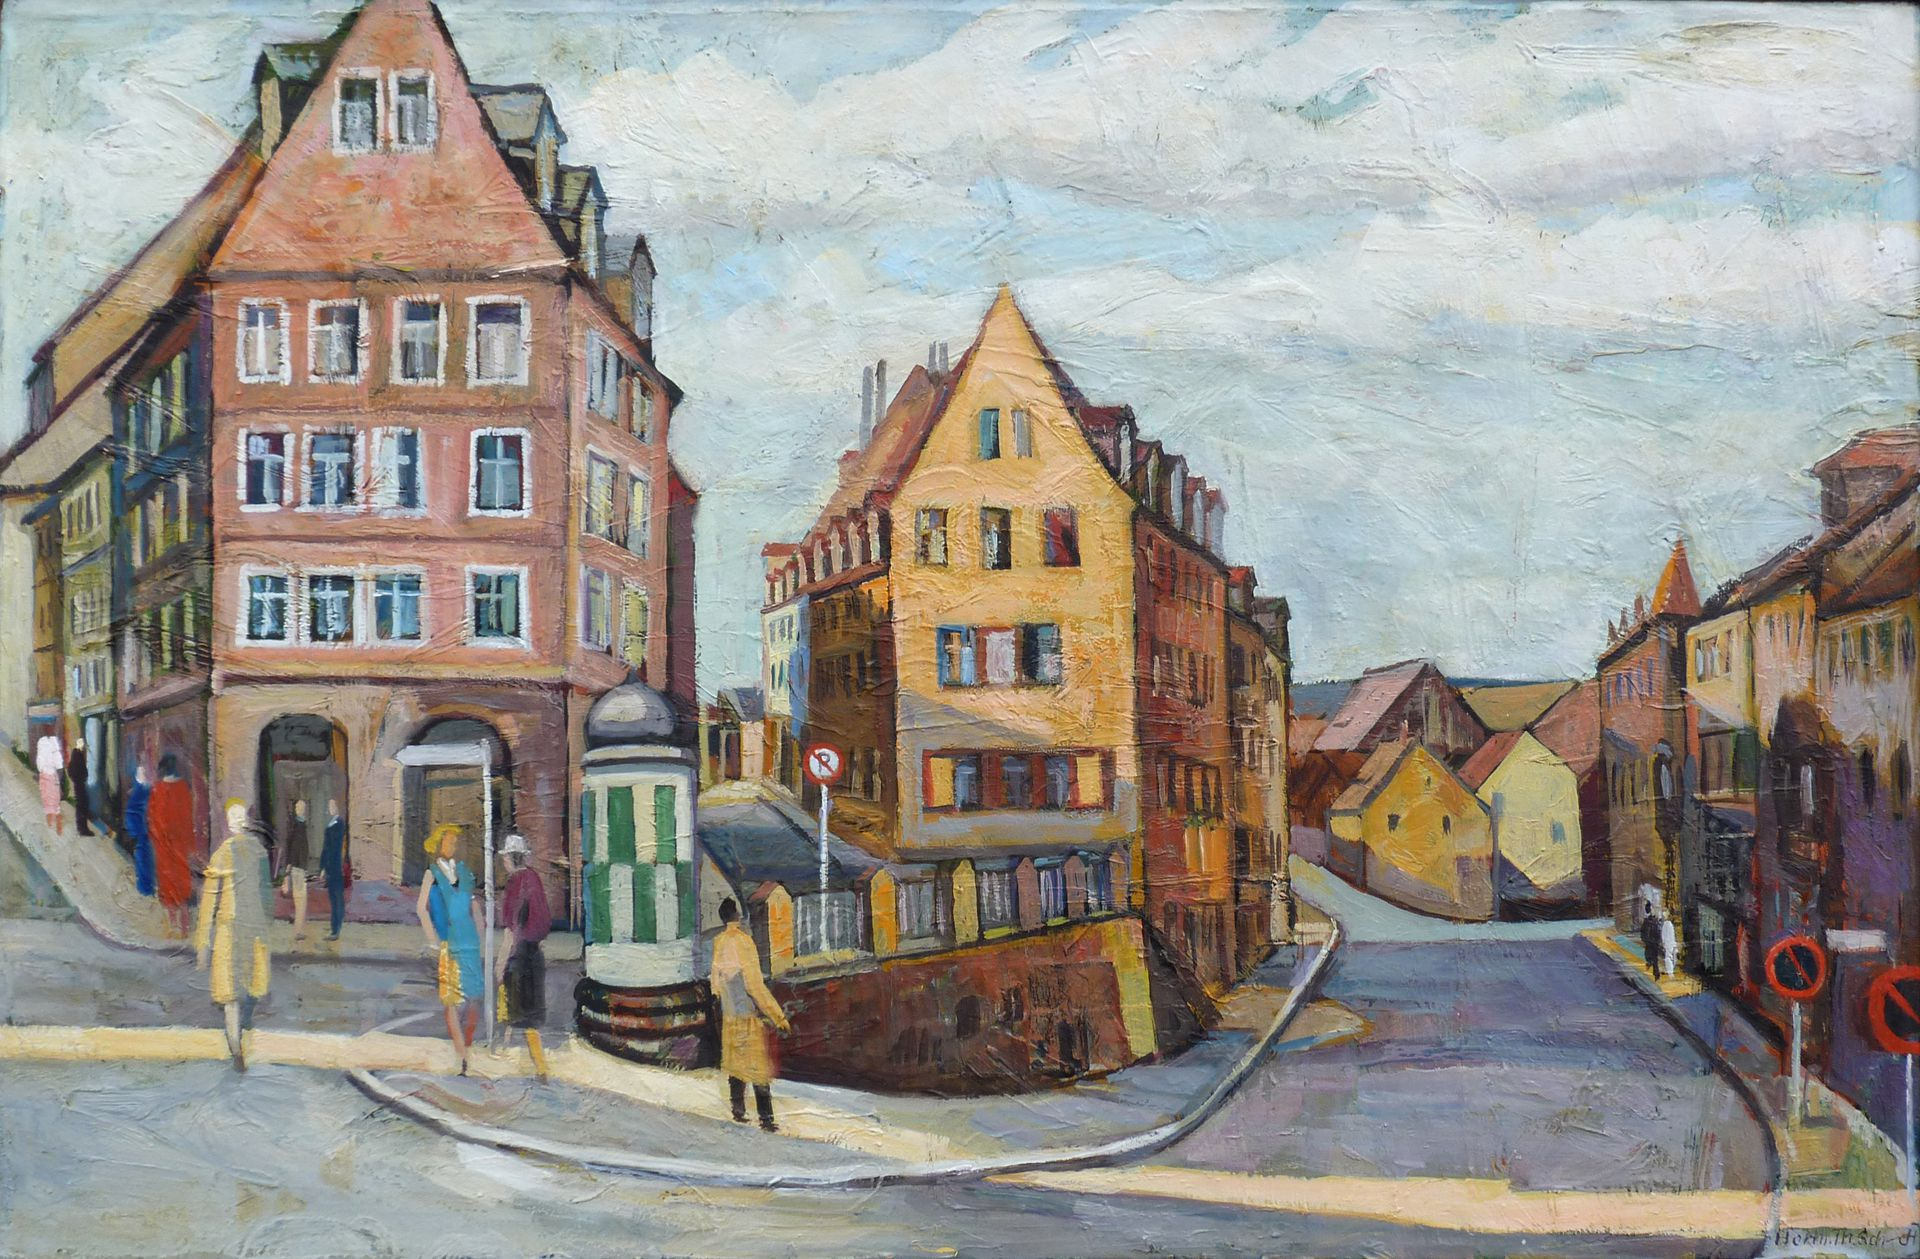 Kaiserstraße / Obere Wörthstraße Kaiserstraße / Obere Wörthstraße